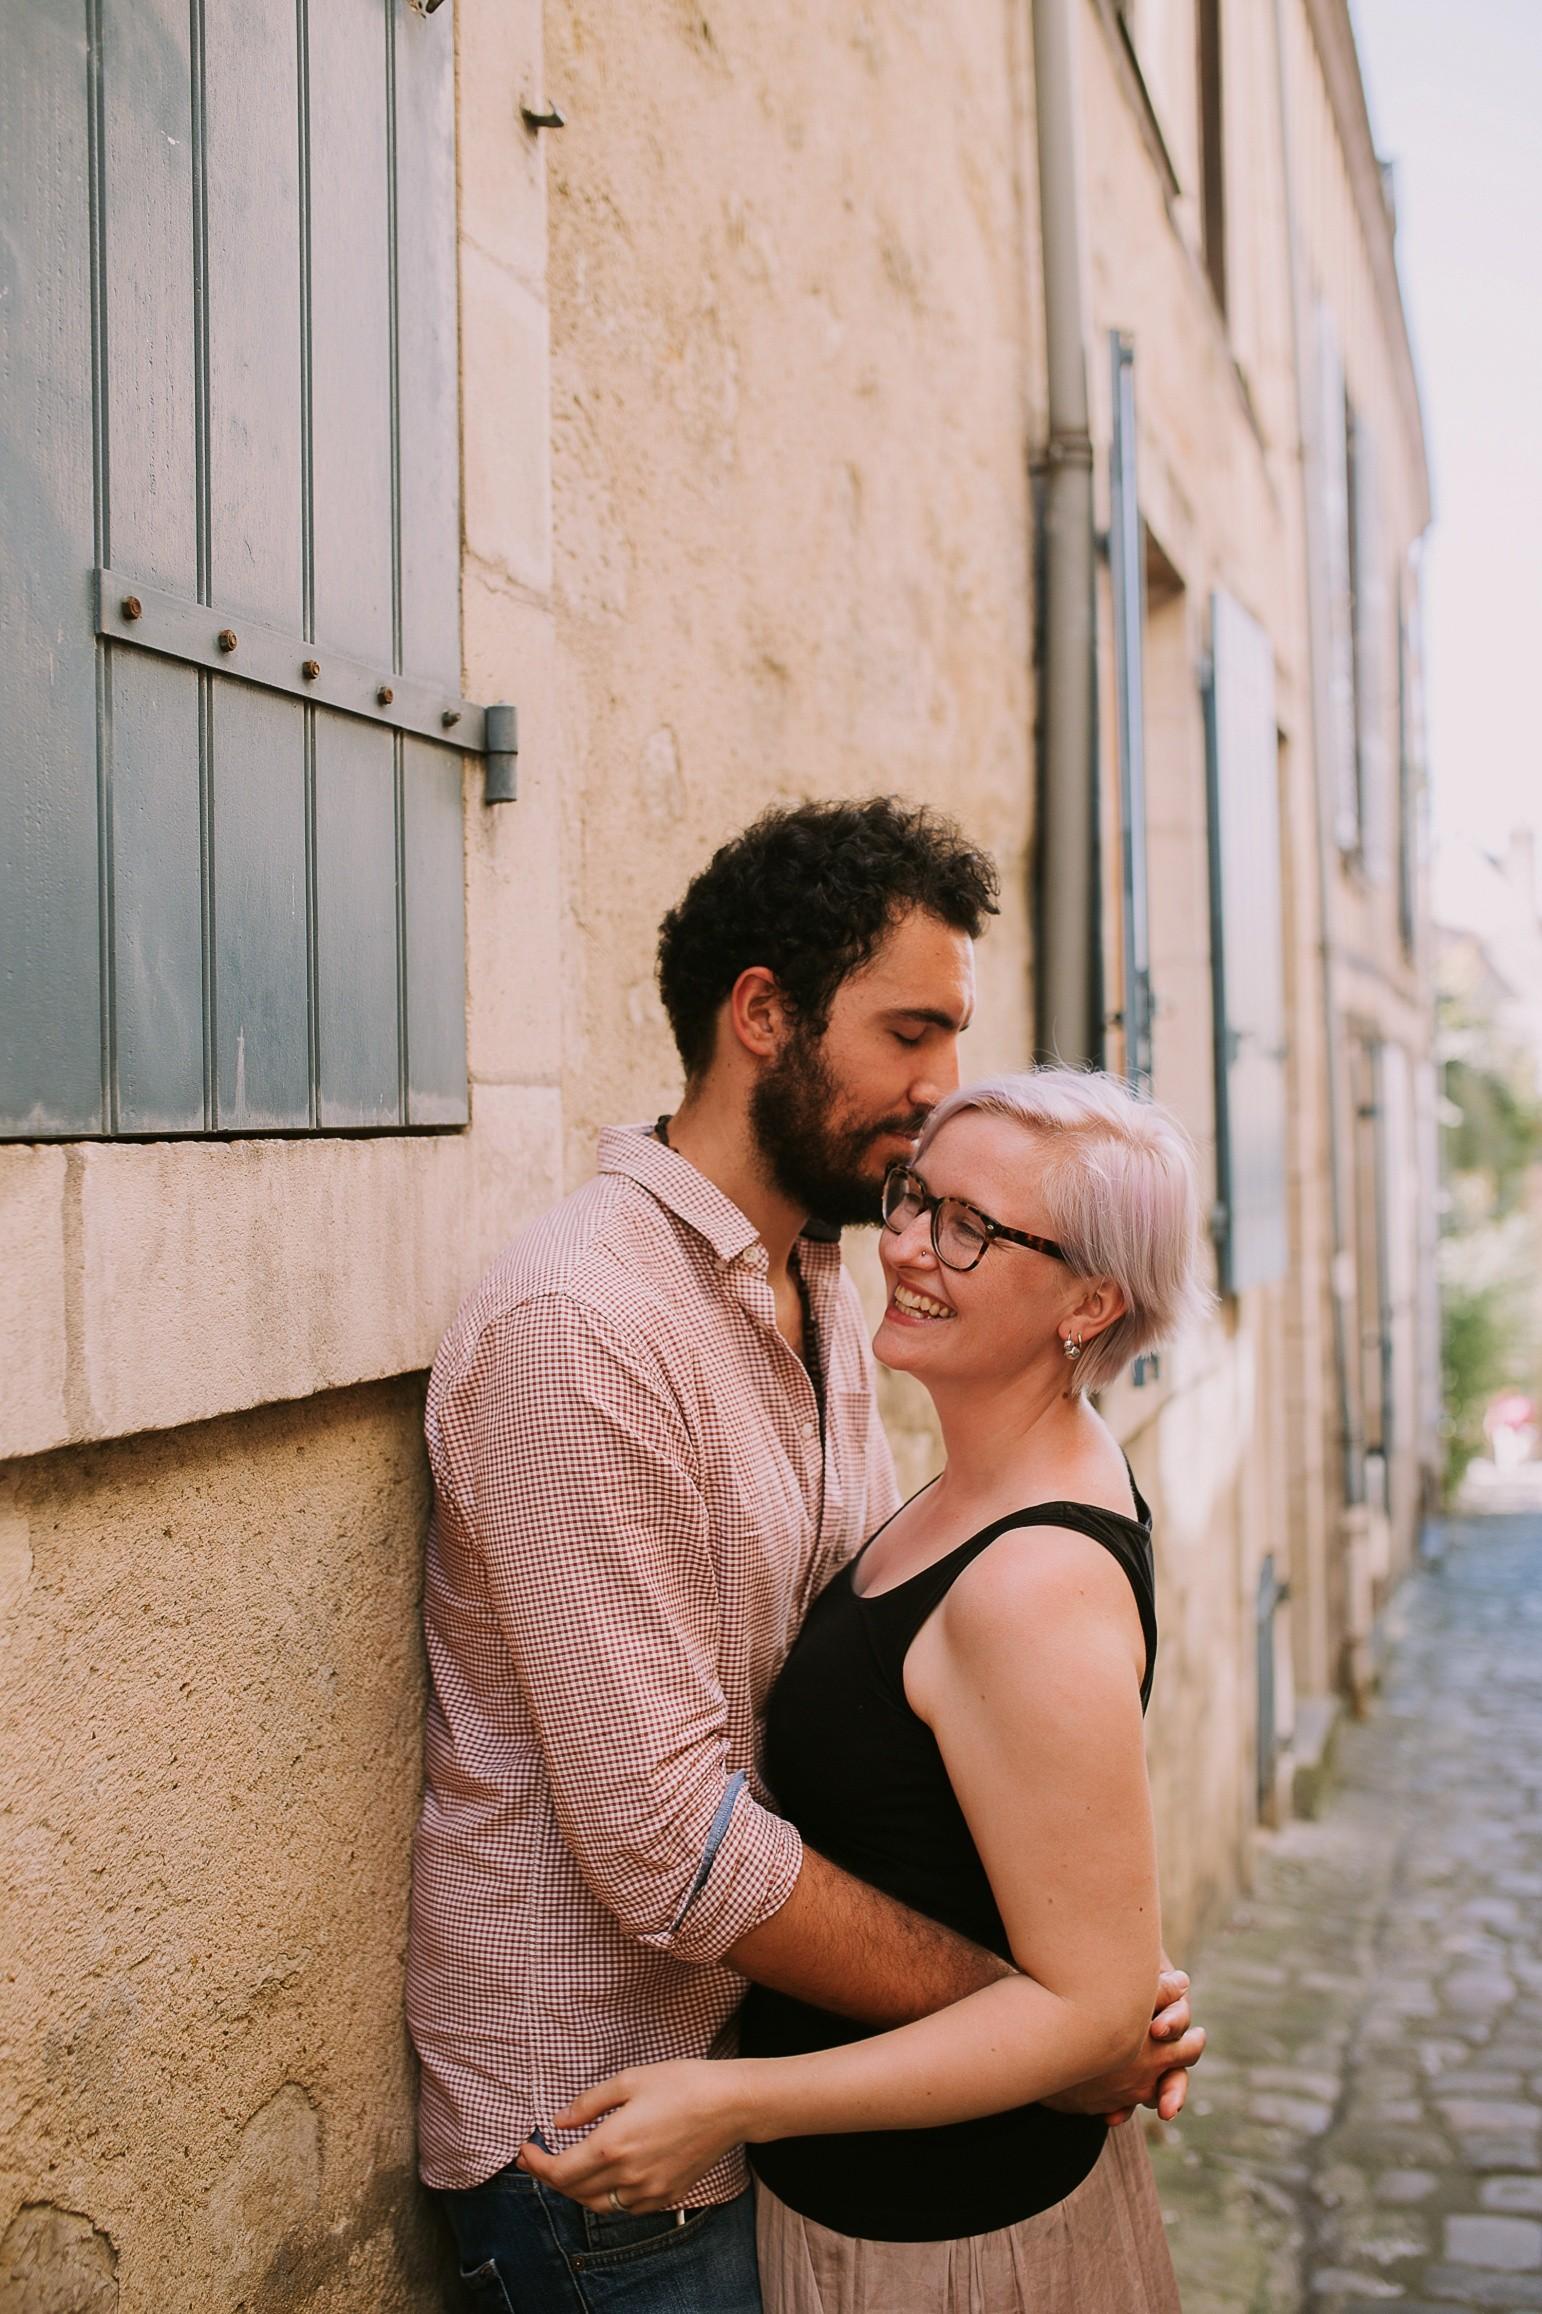 kateryna-photos-mariage-photographe-pornic-bretagne-nantes-couple-engagement-love-story-le-mans-wedding_0203.jpg